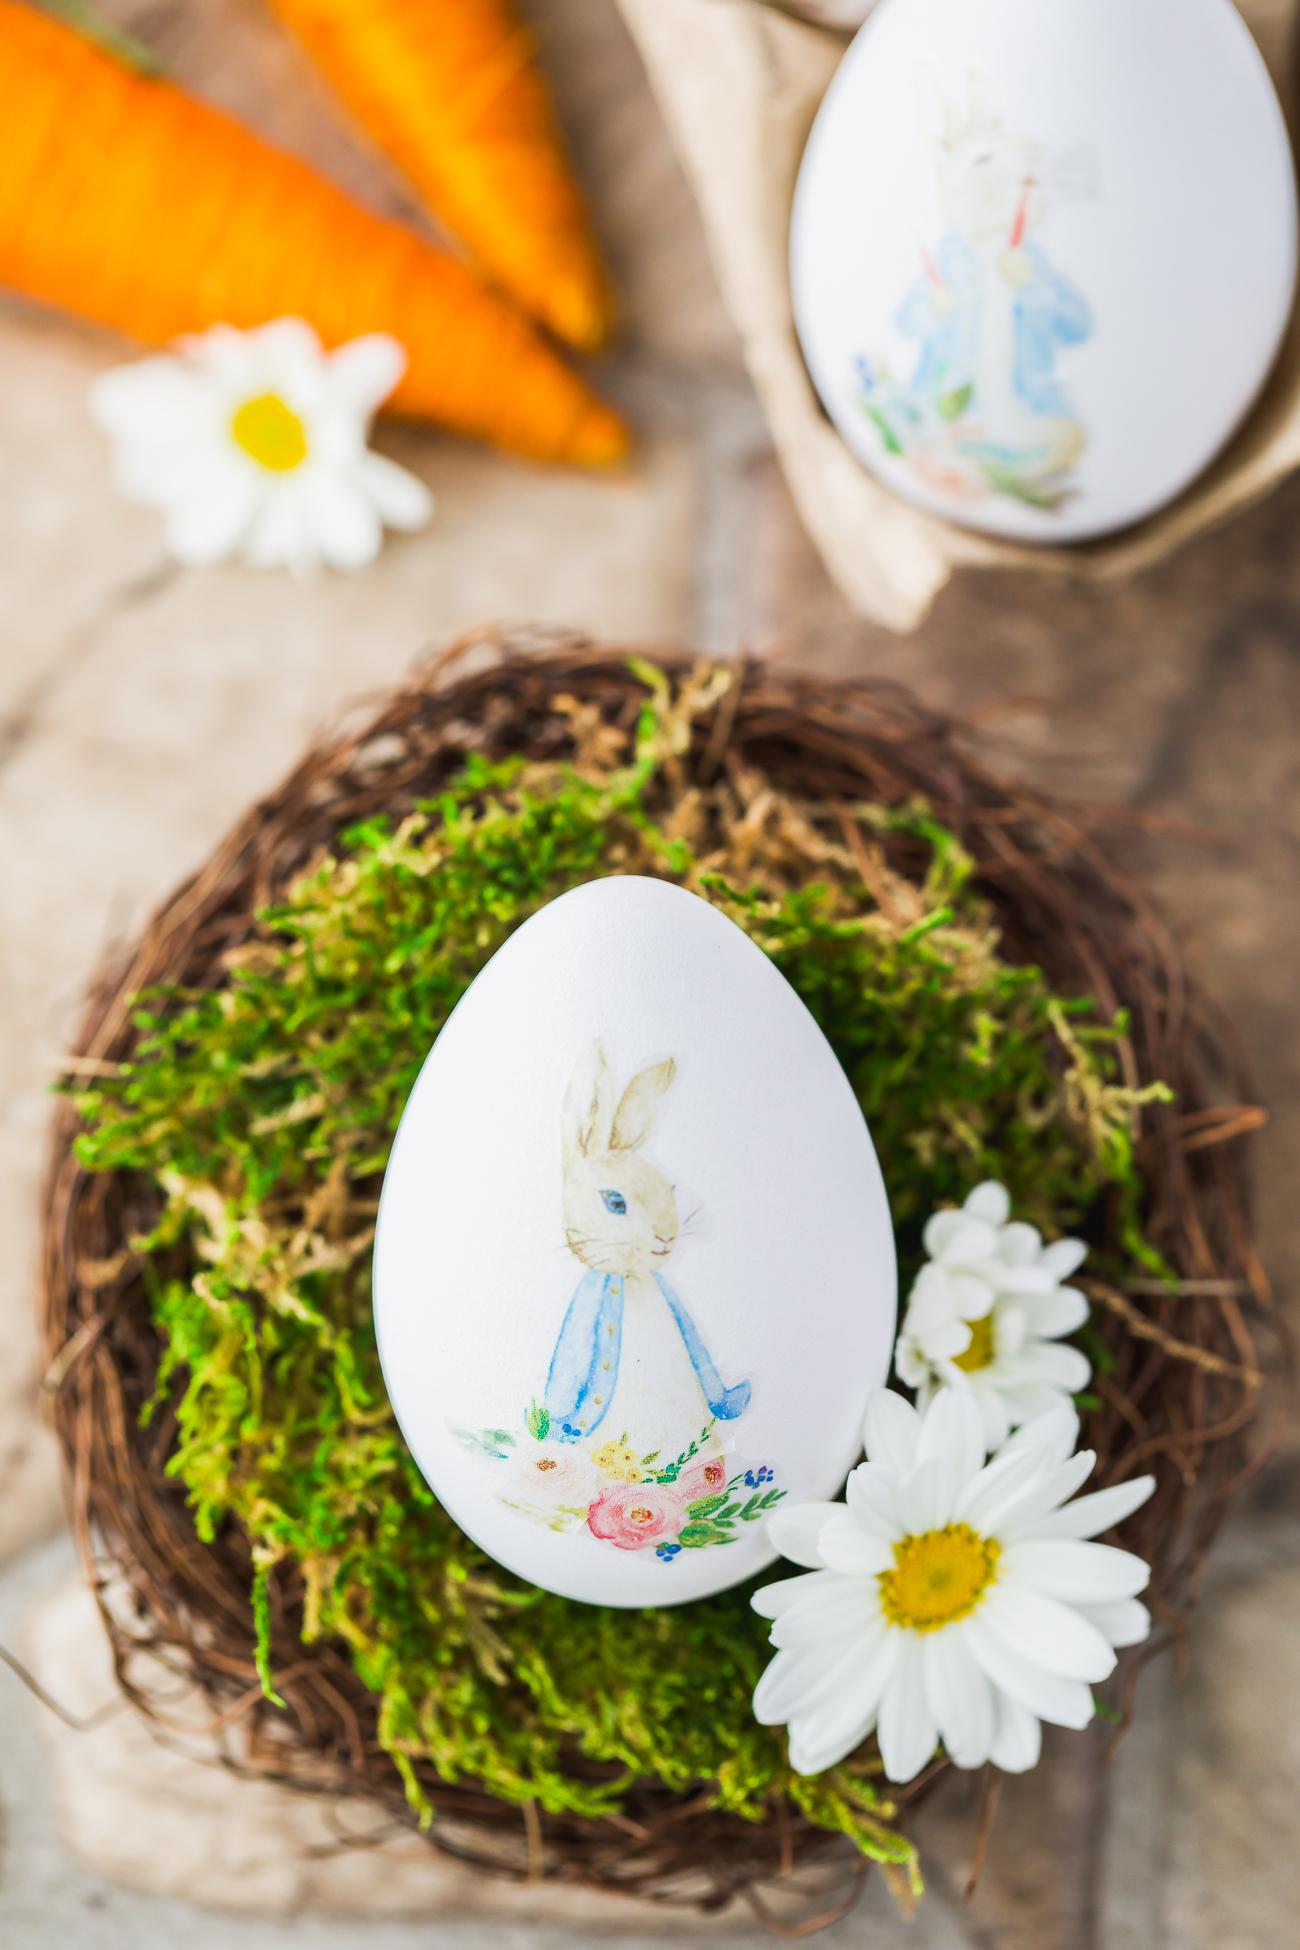 watercolor Peter Rabbit egg craft decor